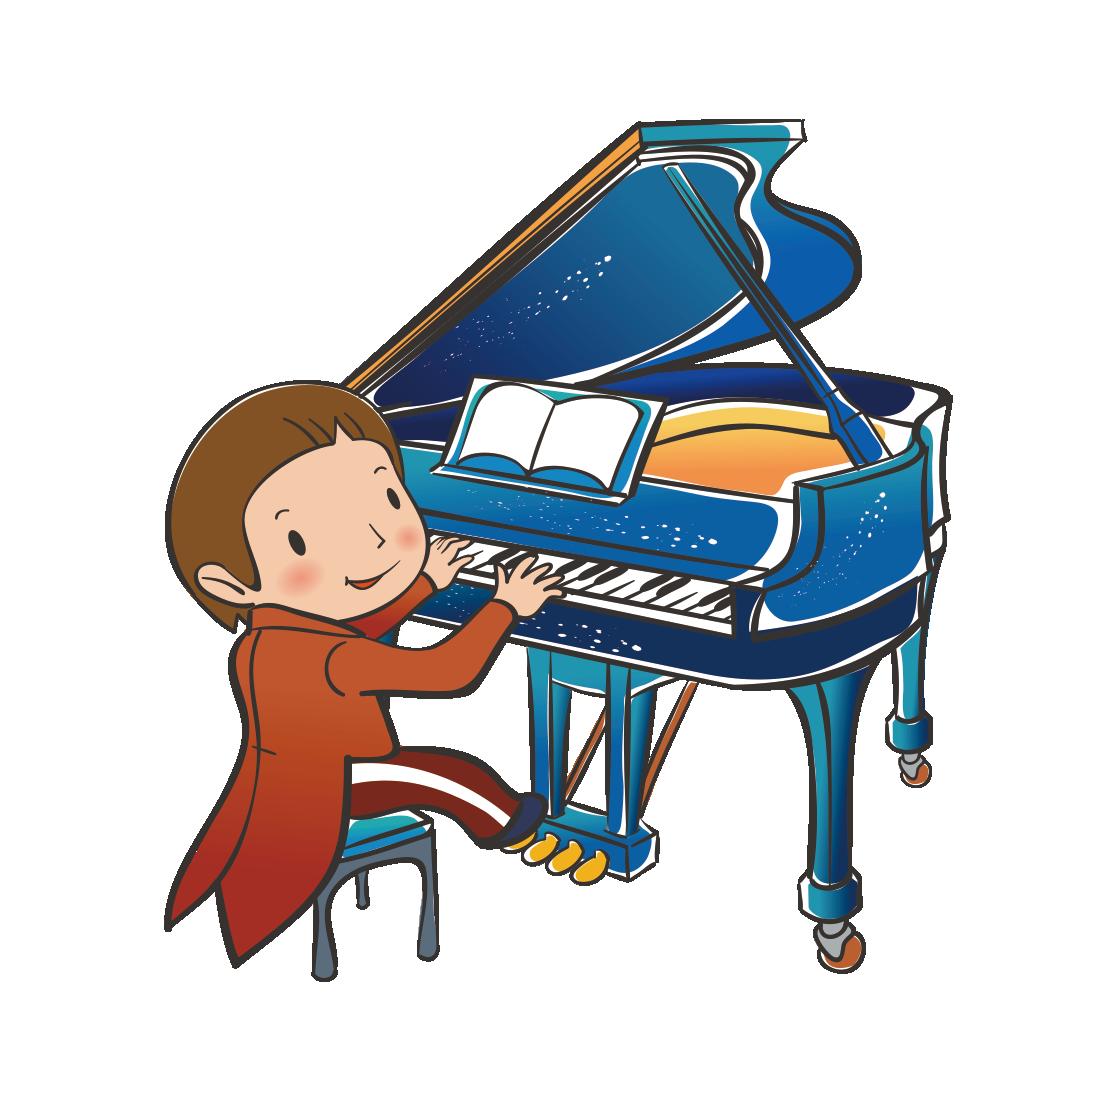 钢琴贴纸 messages sticker-5